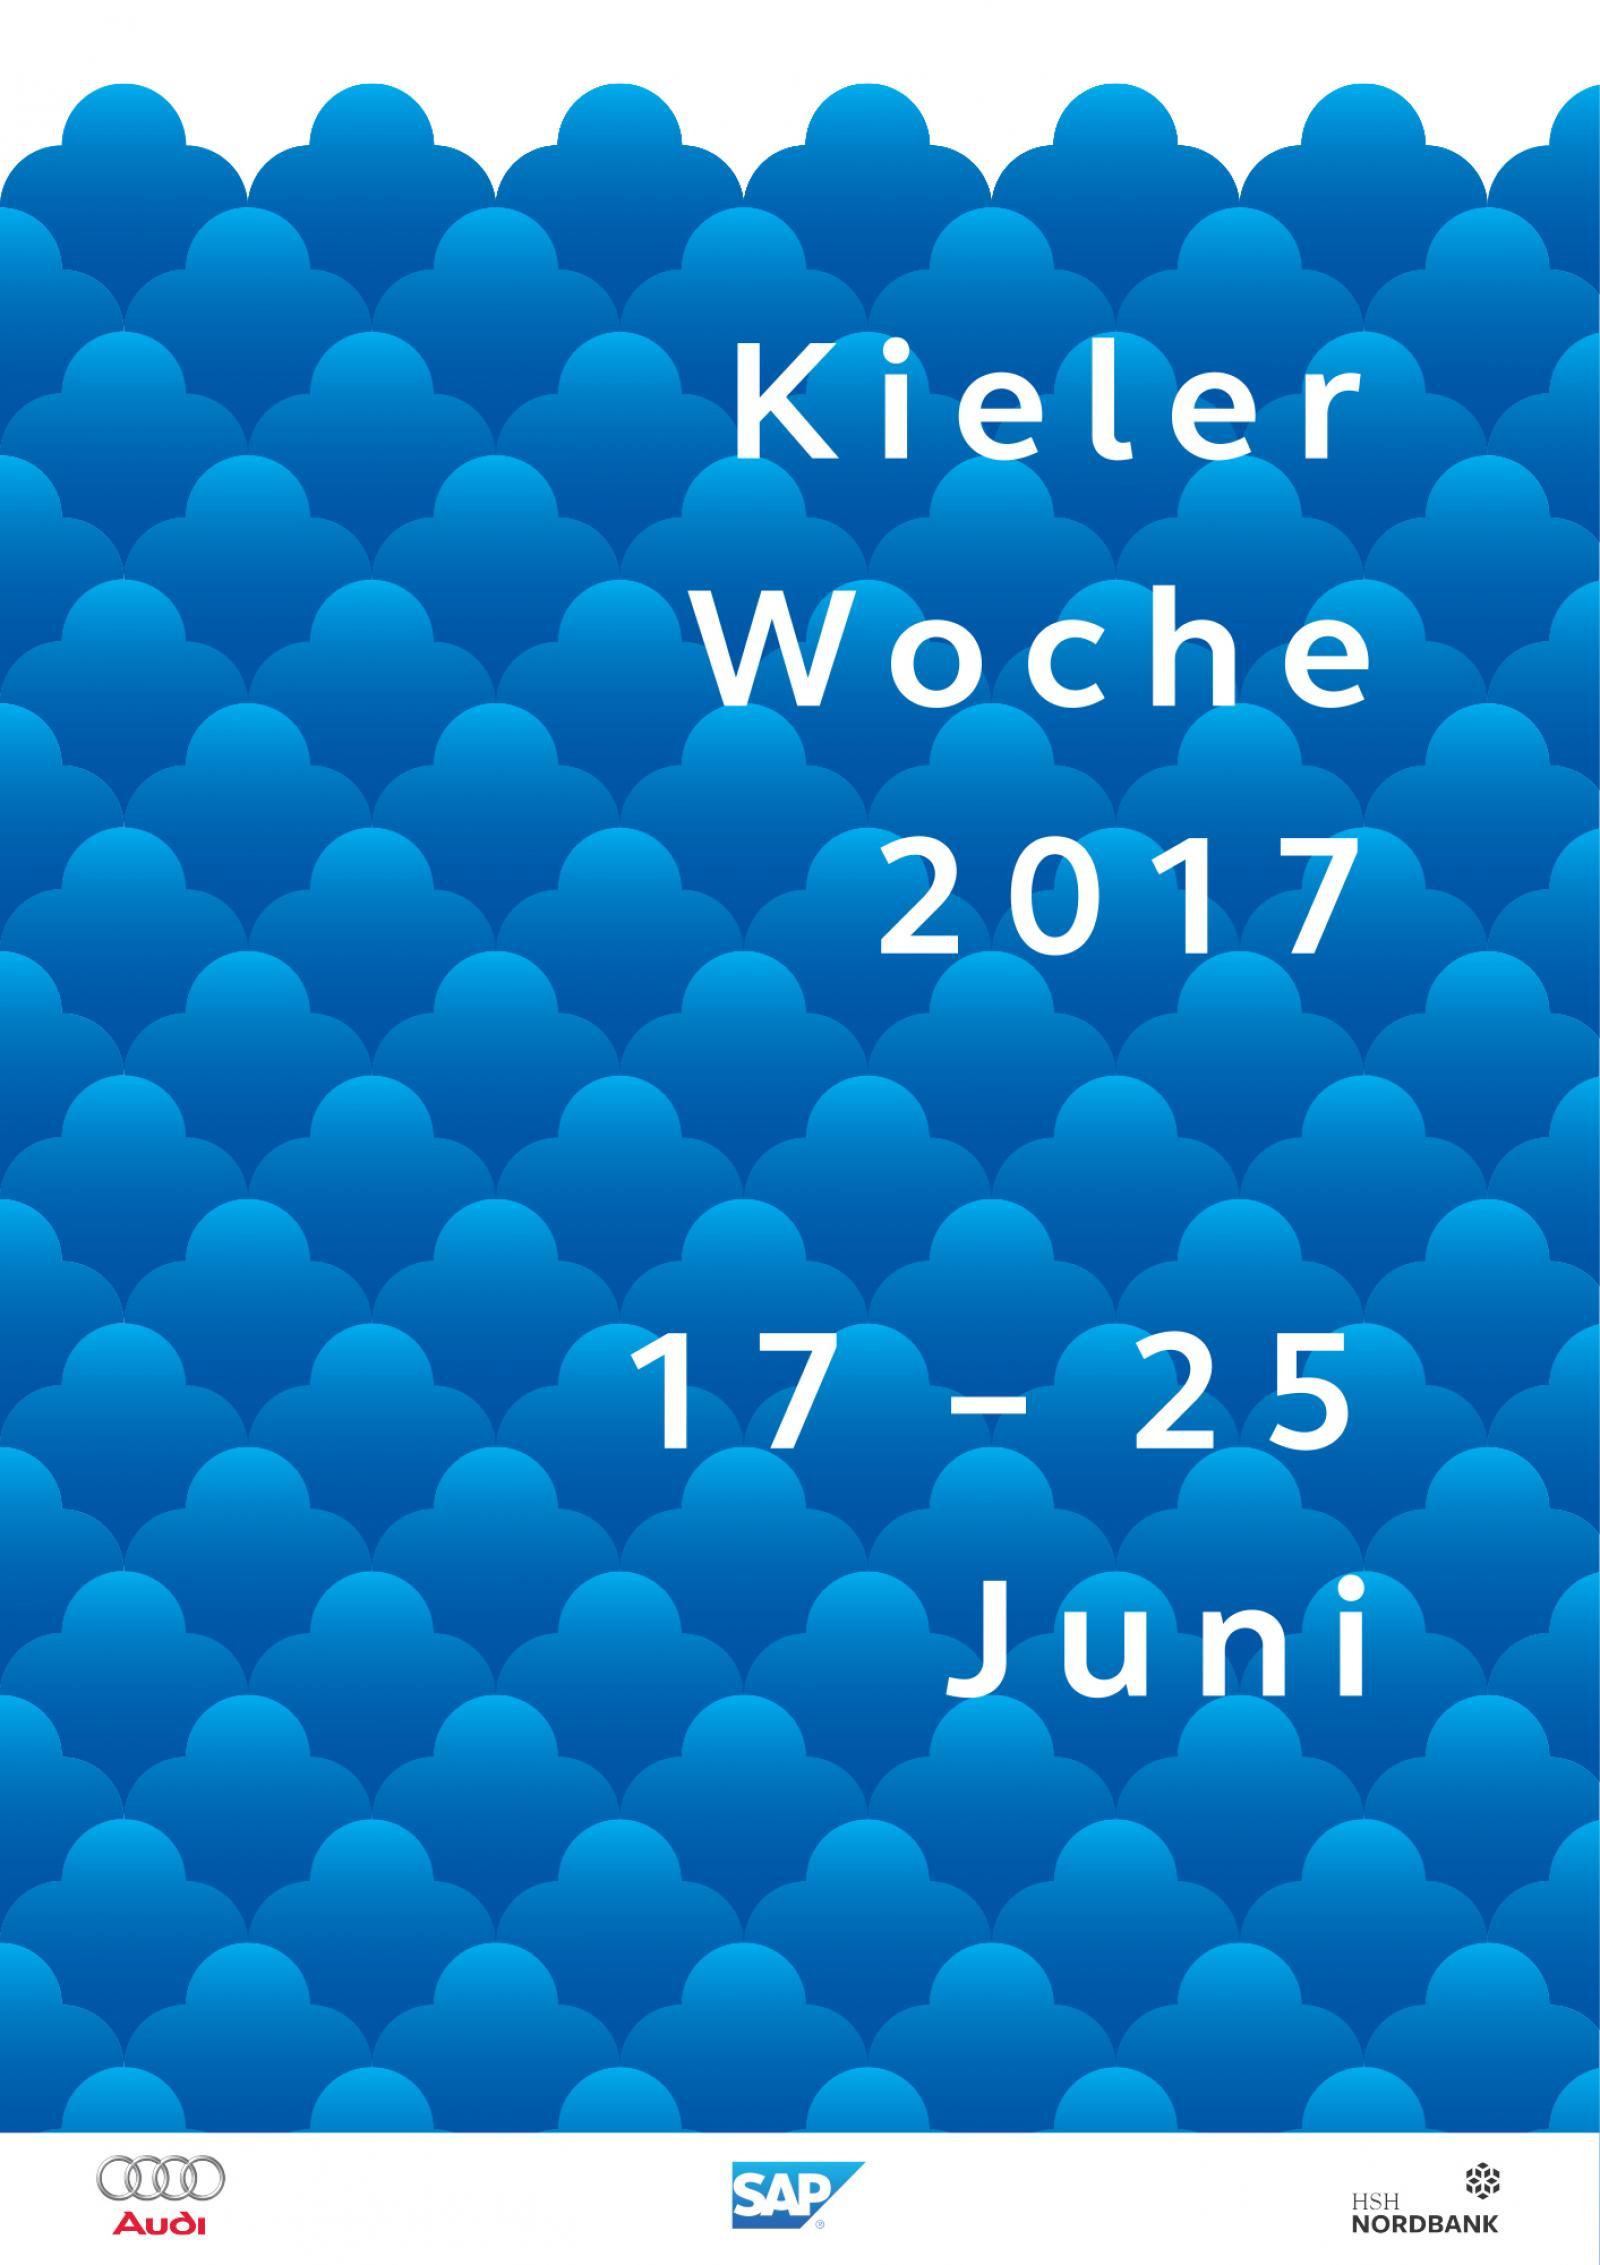 Visual Identity, Kieler Woche Competition, 2016